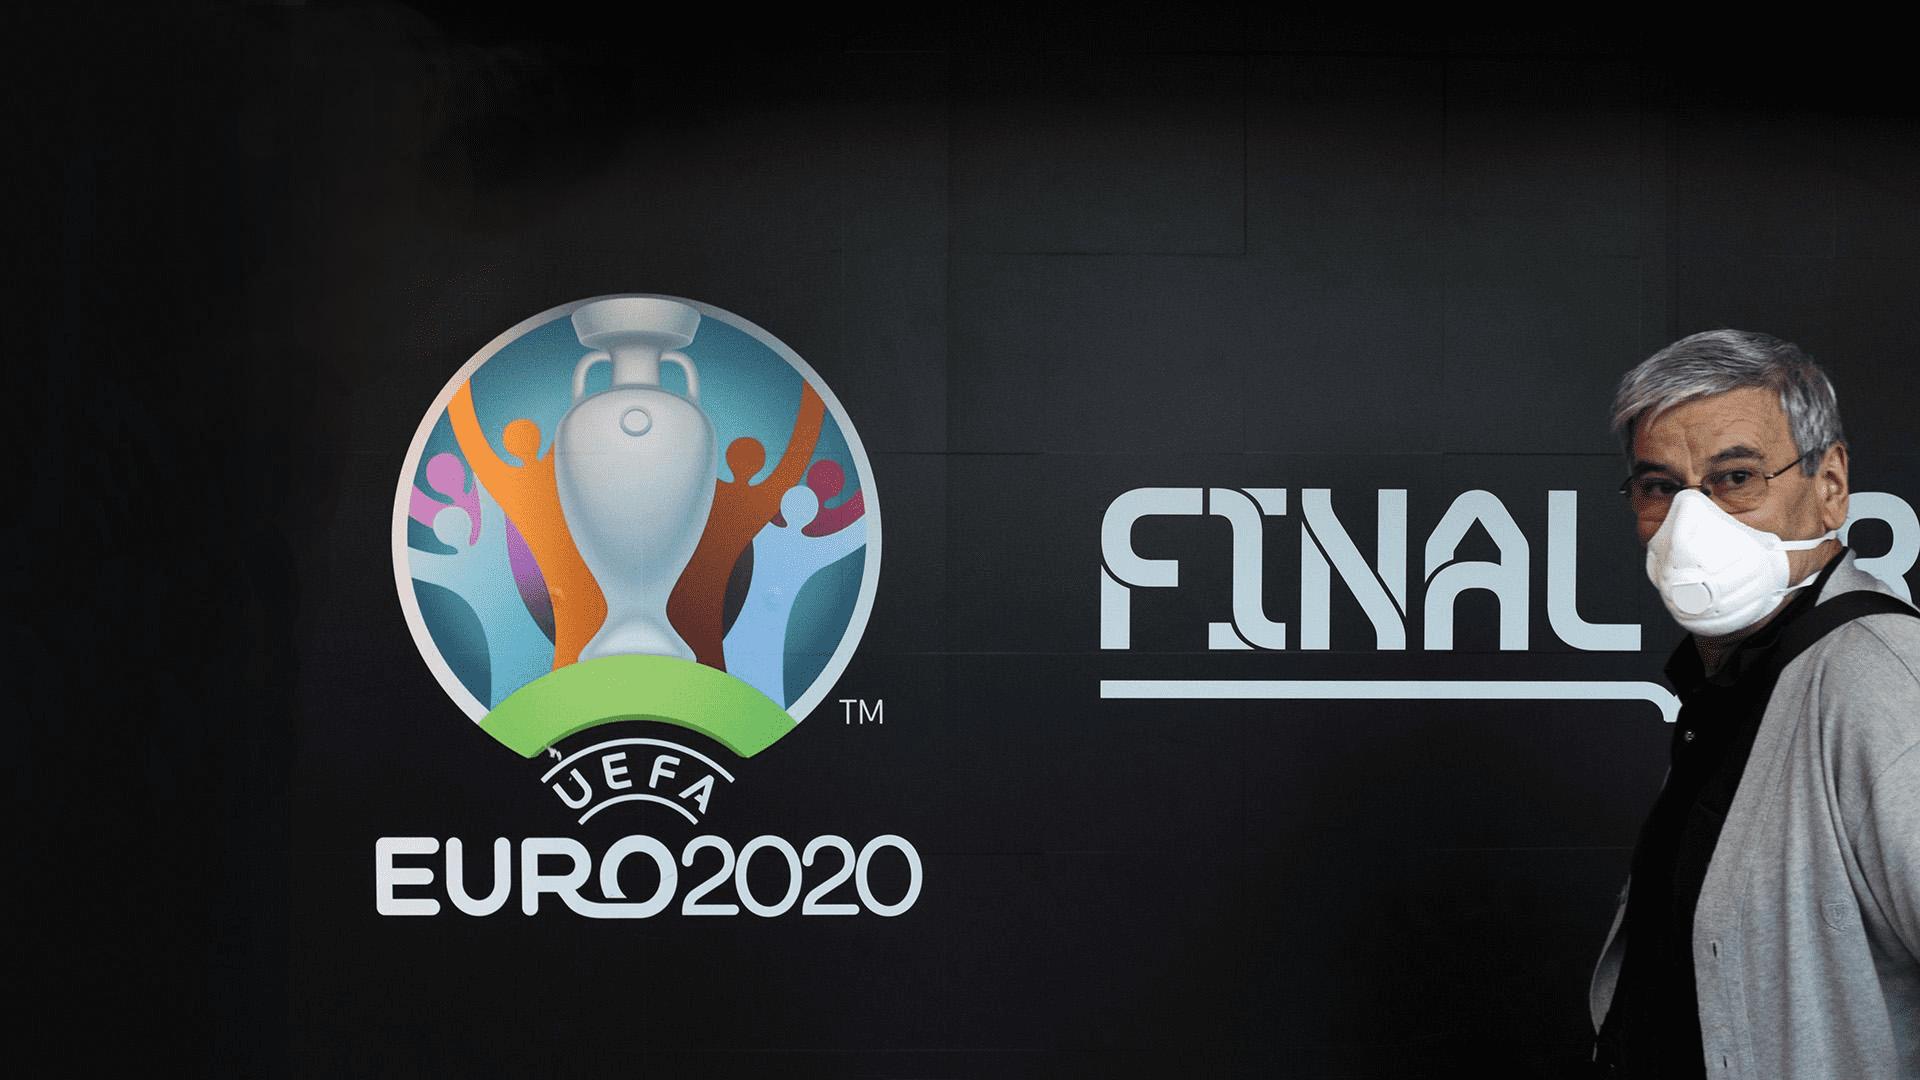 евро 2020 города где пройдут матчи